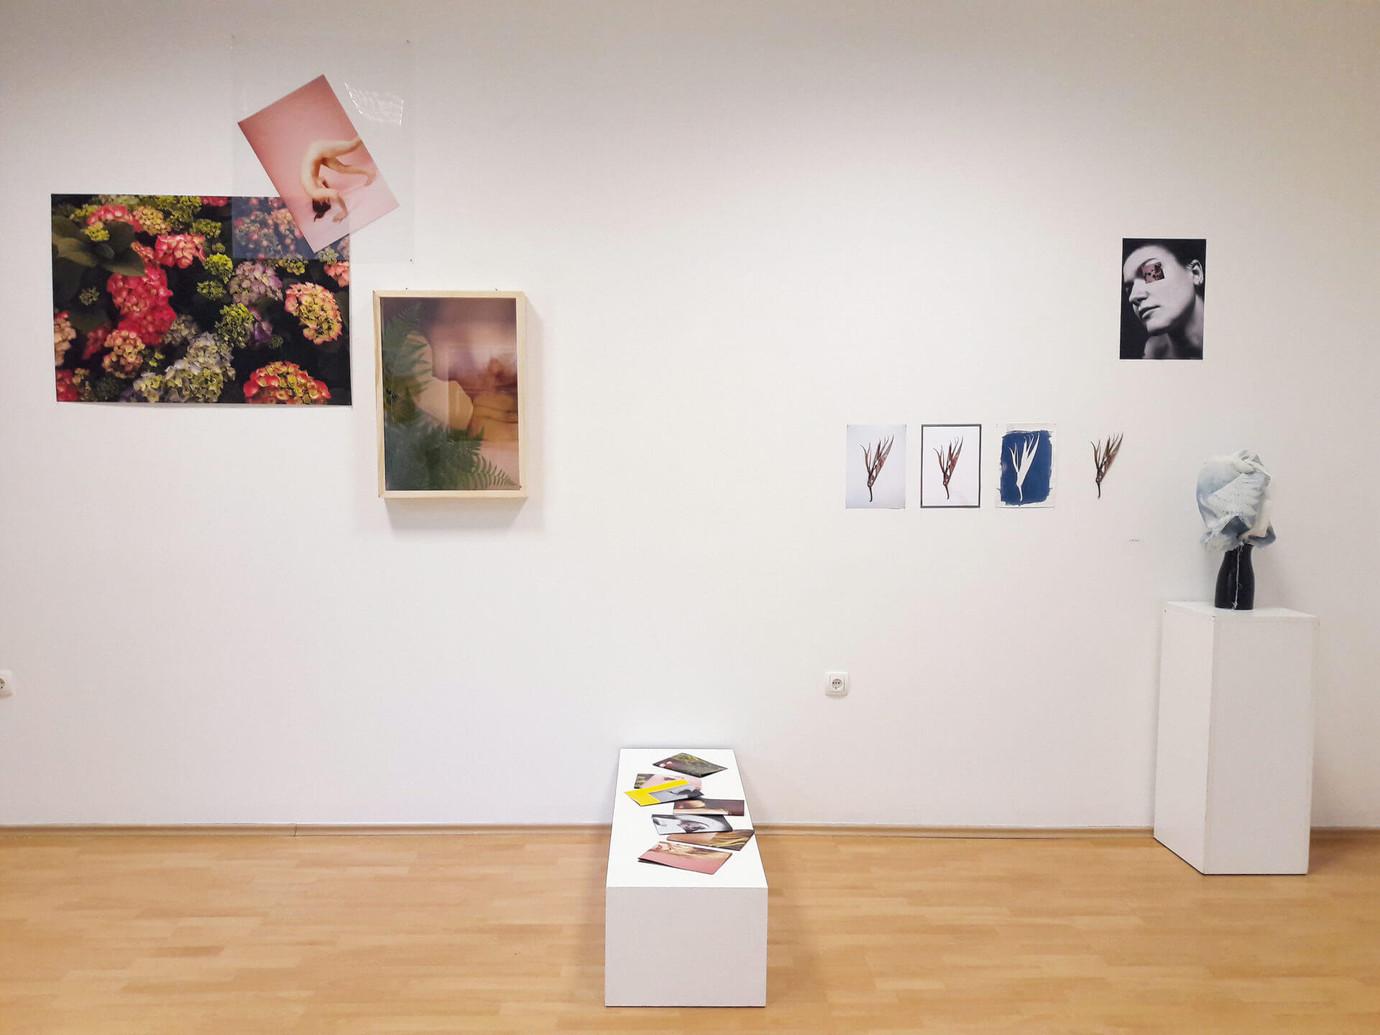 Photon Gallery, Ljubljana, Slovenia, 2017